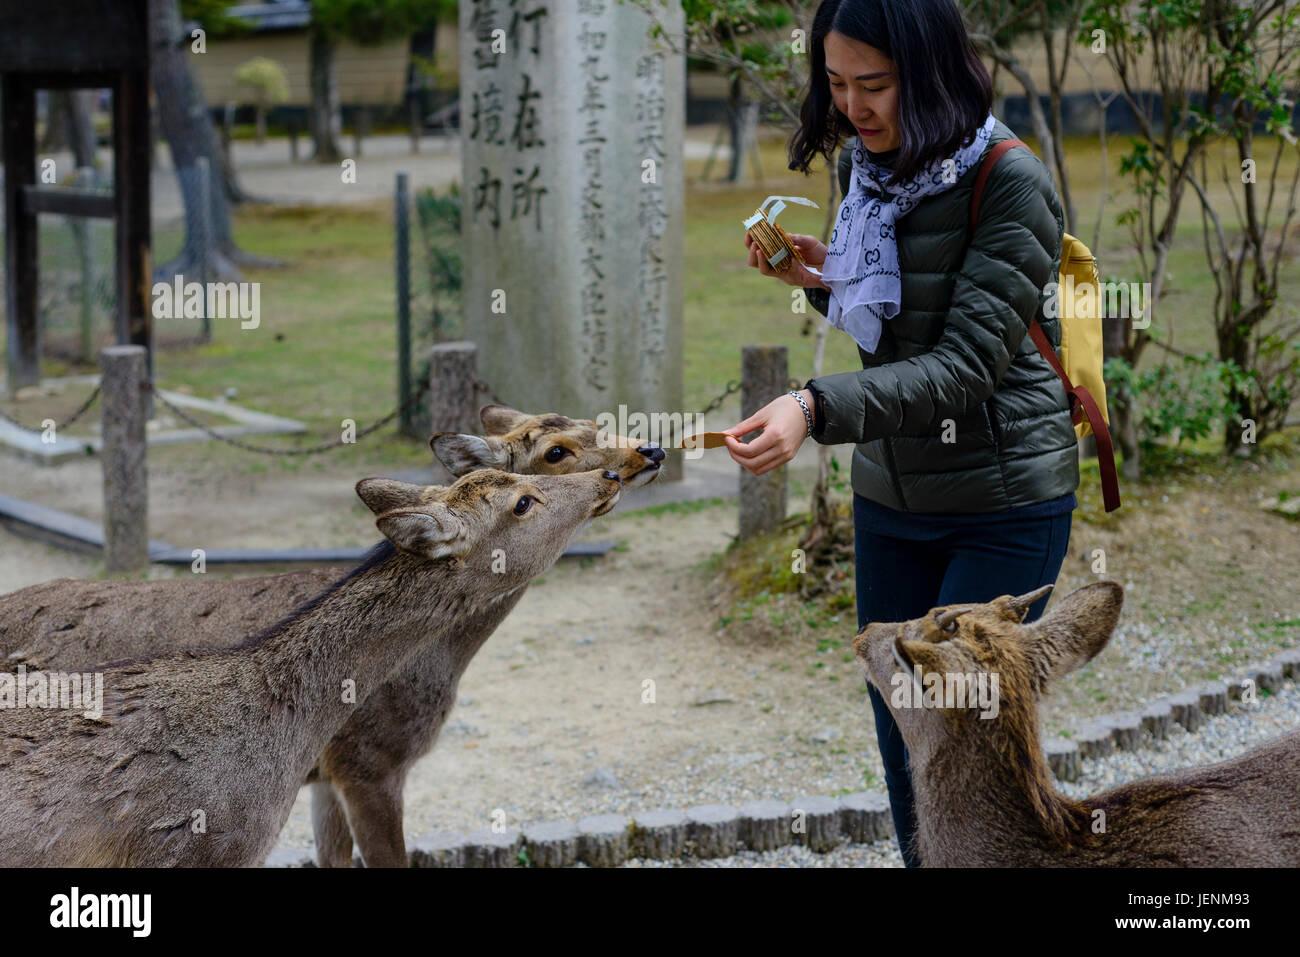 Nara - Stock Image